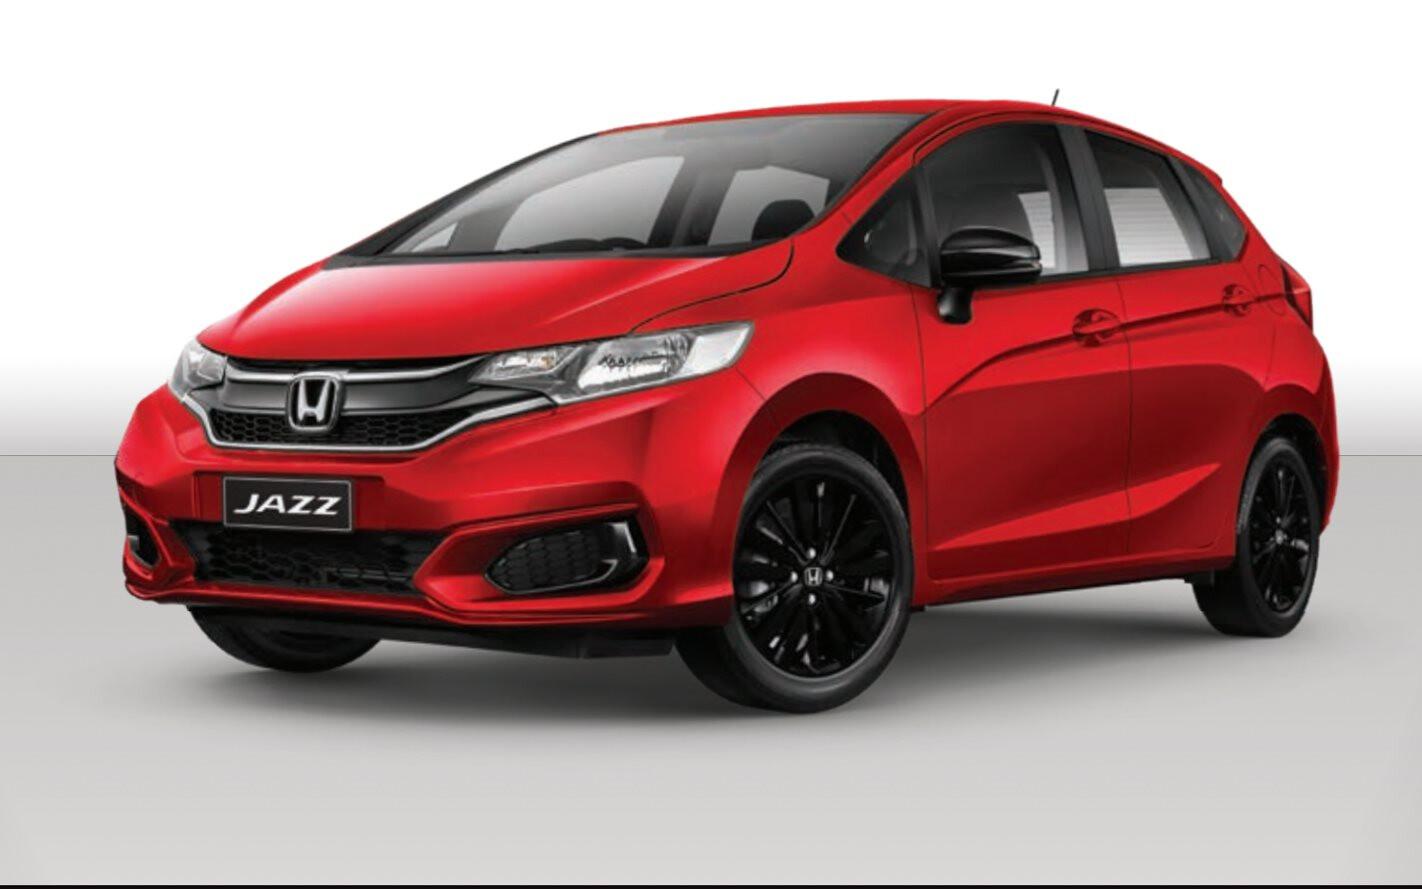 2021 Honda Jazz Final Edition